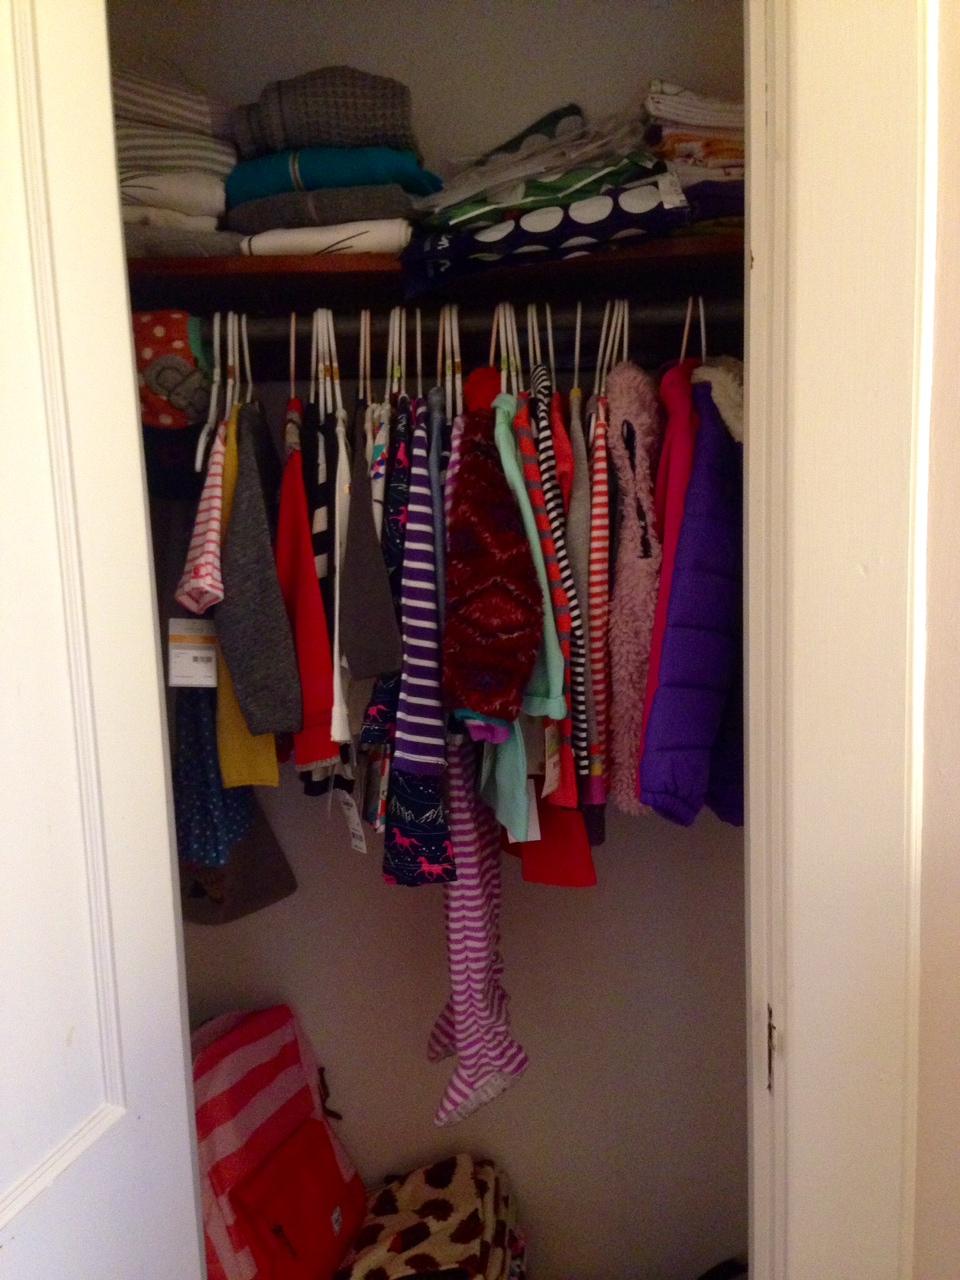 K's closet (my weakness!)